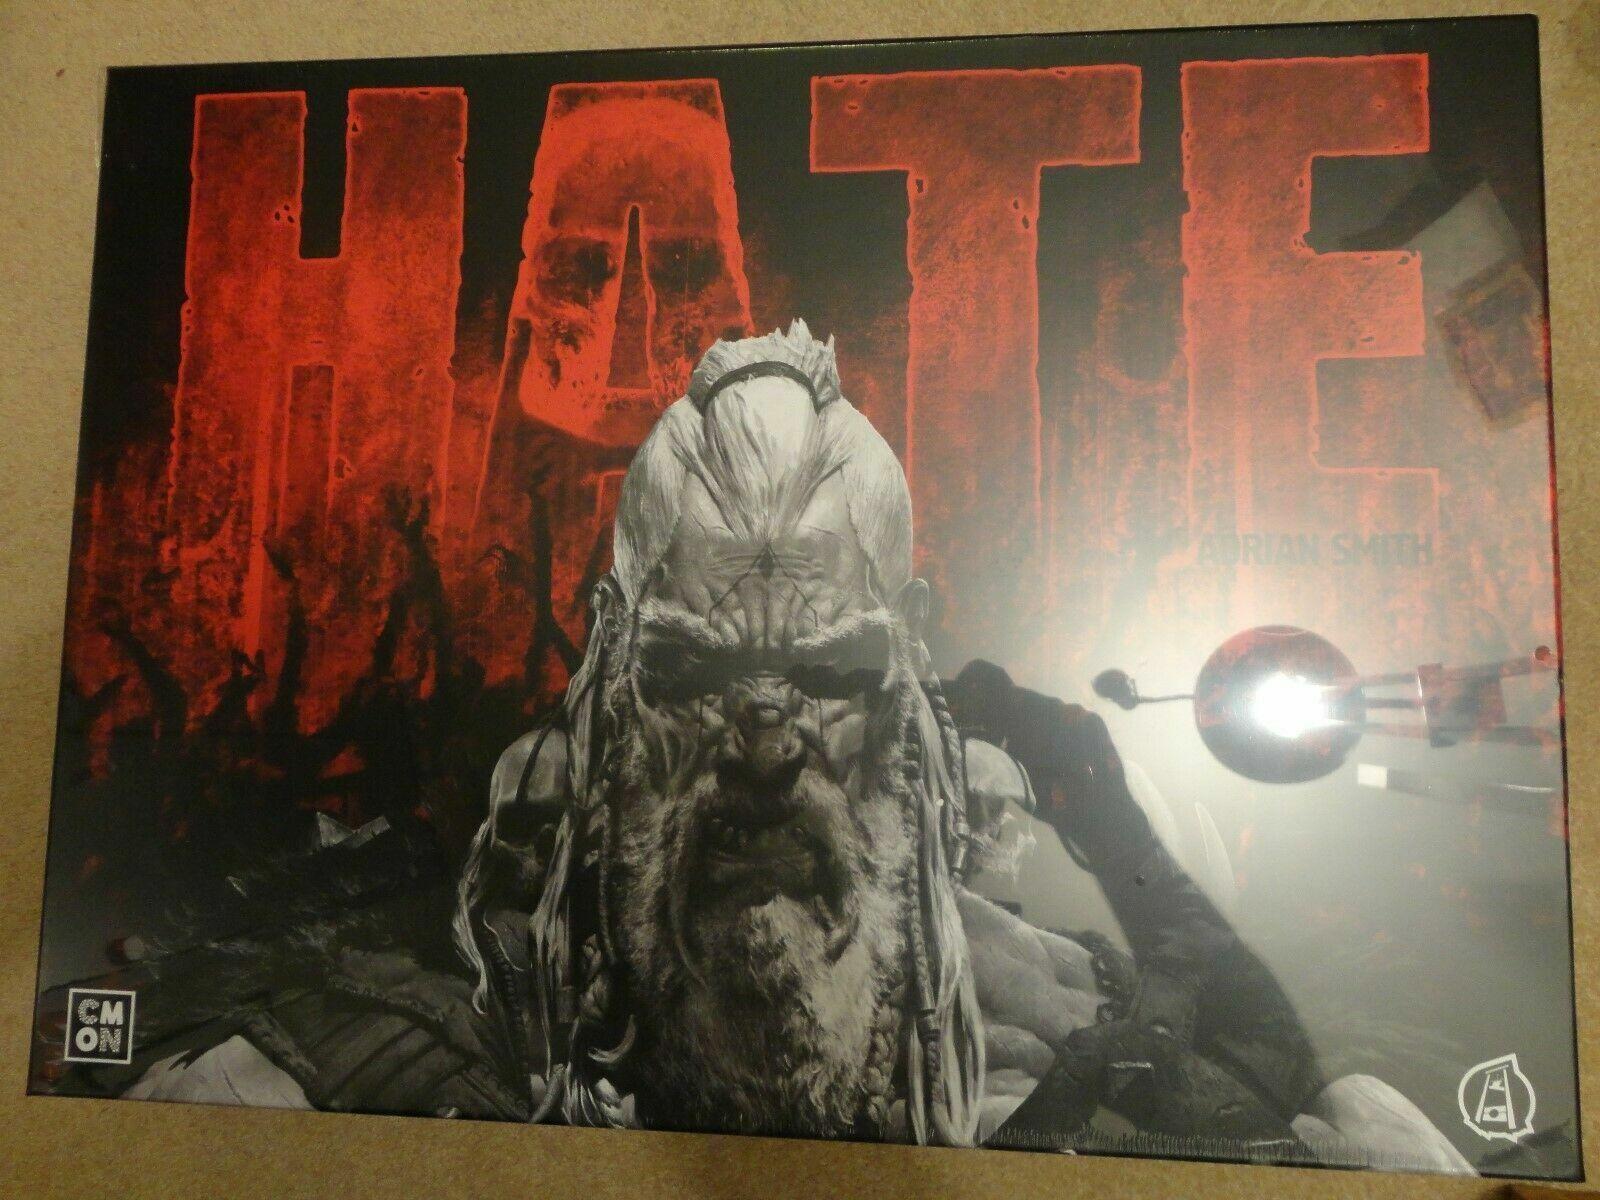 Haine Board Game pédale de démarrage Exclusive-Tyran promesse + Stretch objectifs + add-ons-rea